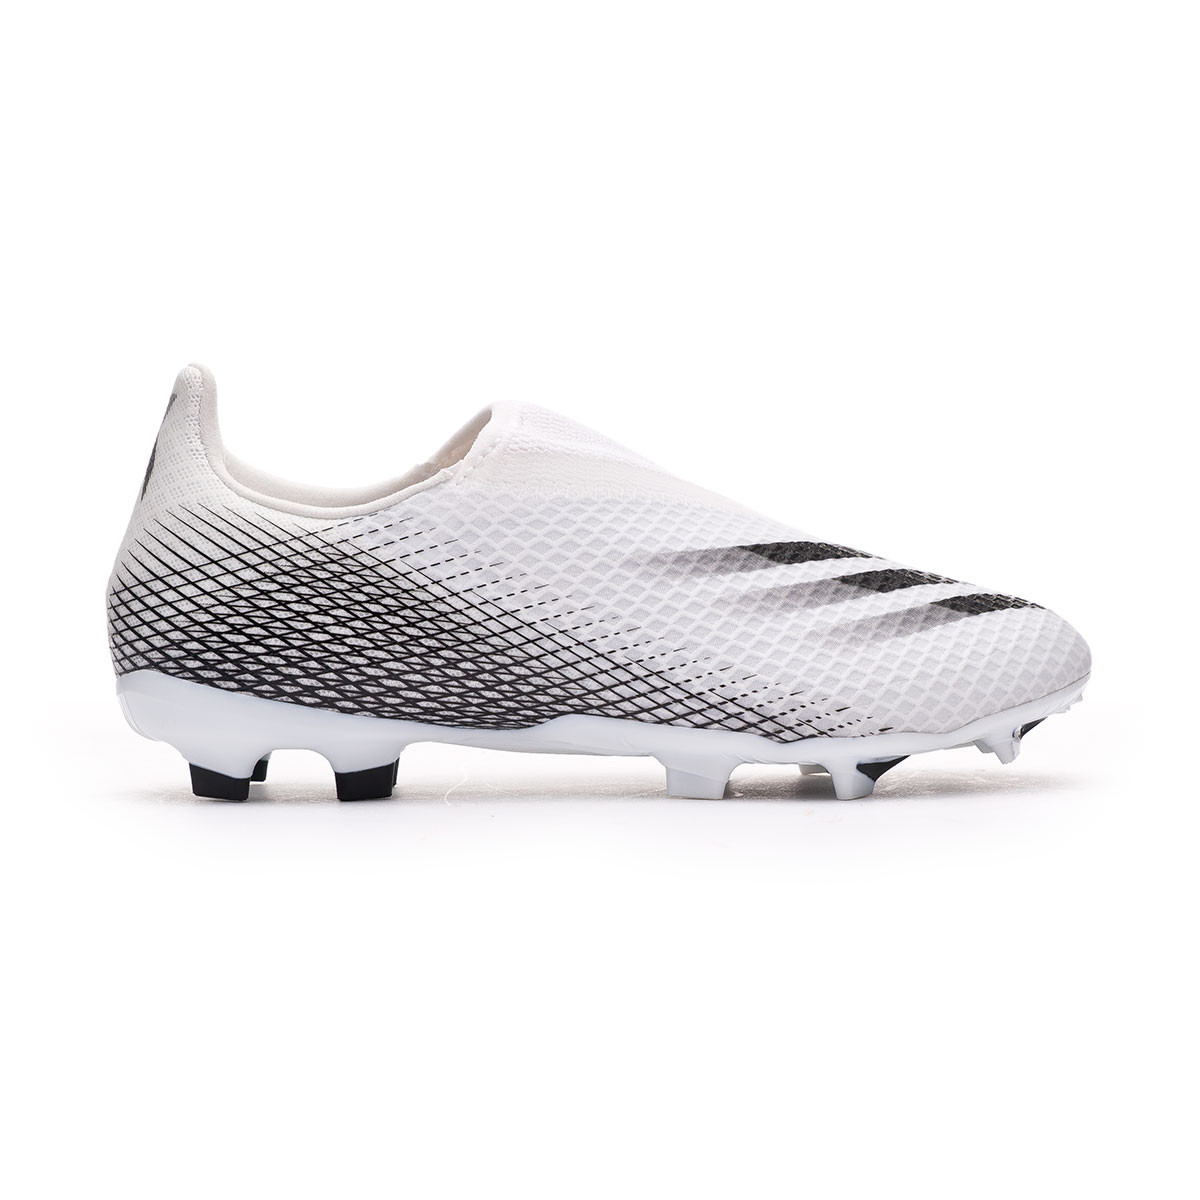 Corta vida código postal cable  Bota de fútbol adidas X Ghosted.3 LL FG Niño White-Core black-White -  Tienda de fútbol Fútbol Emotion